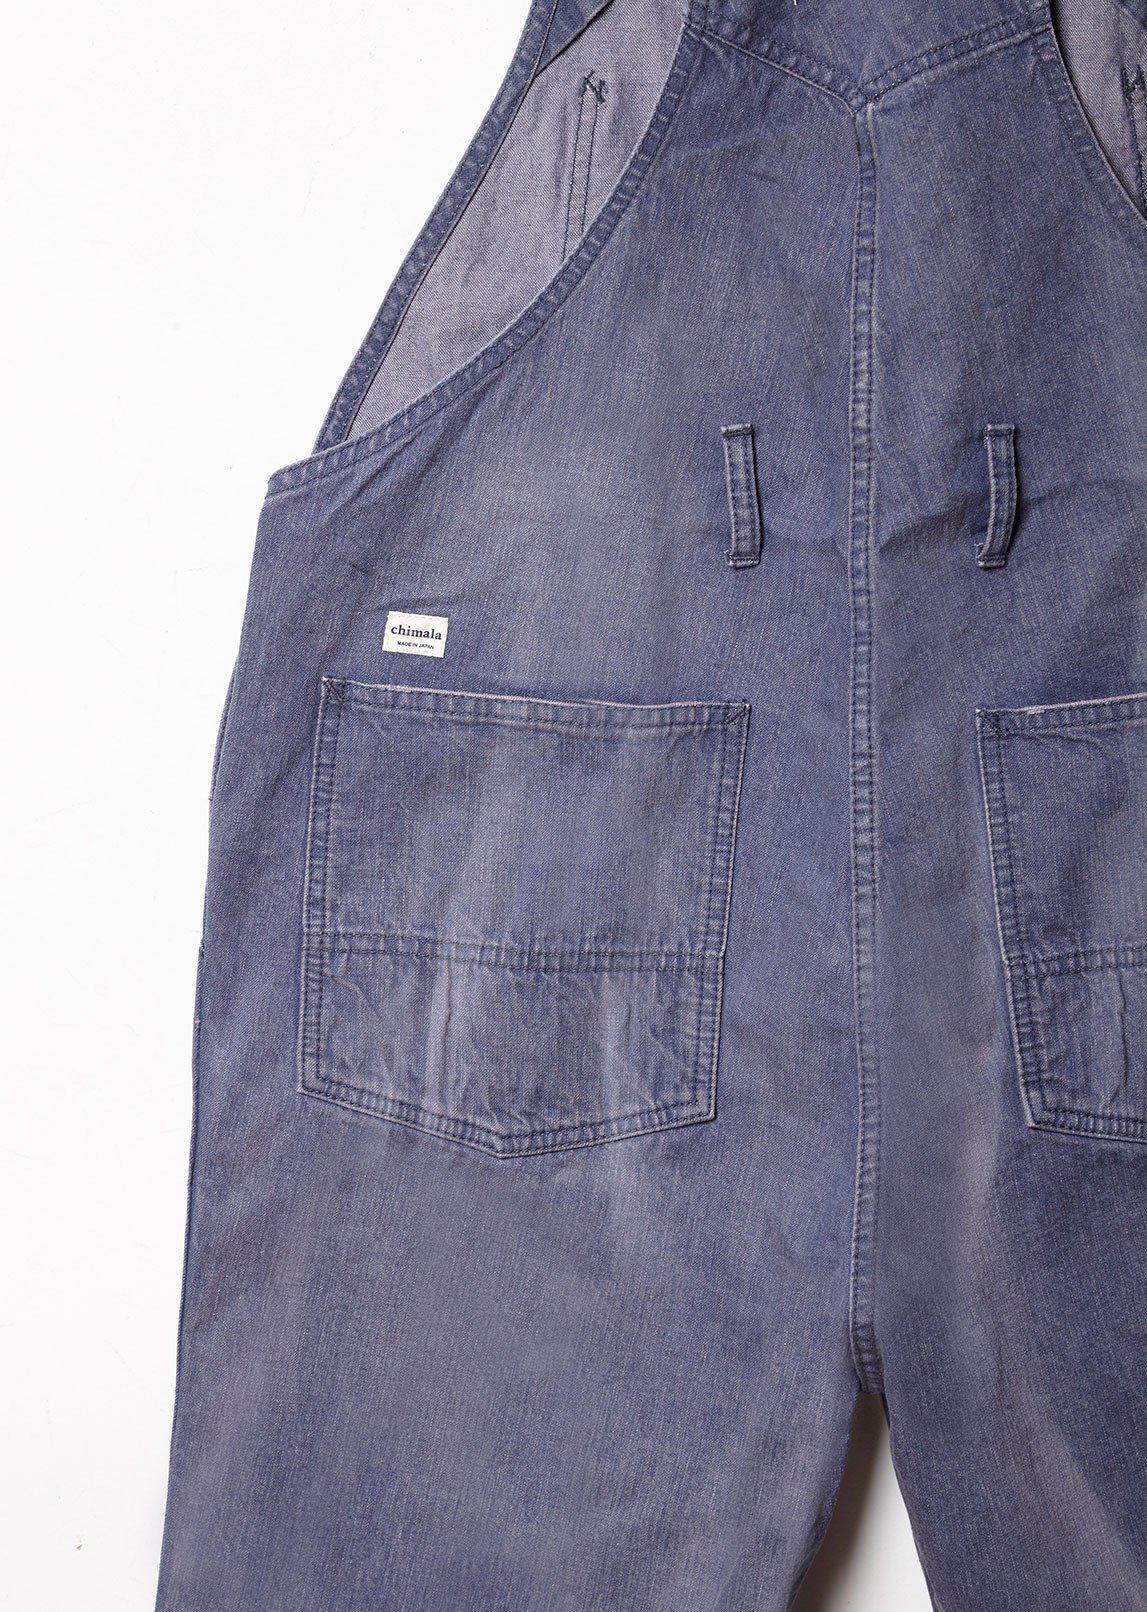 a65a40d058ec Lyst - Chimala Denim Overalls in Blue